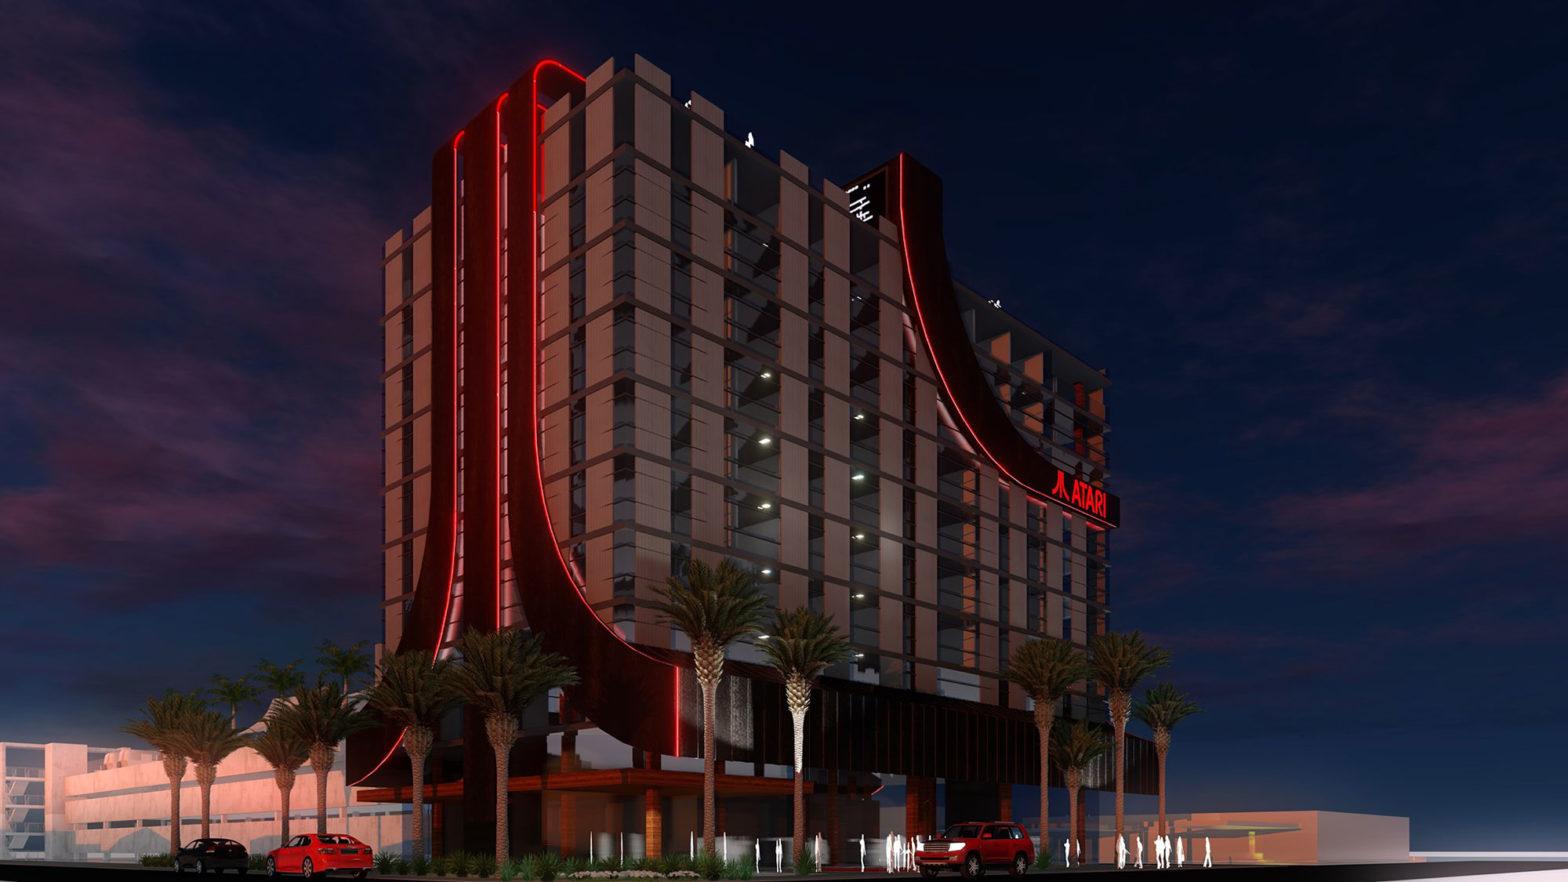 Atari Hotels Video Game-themed Hotel